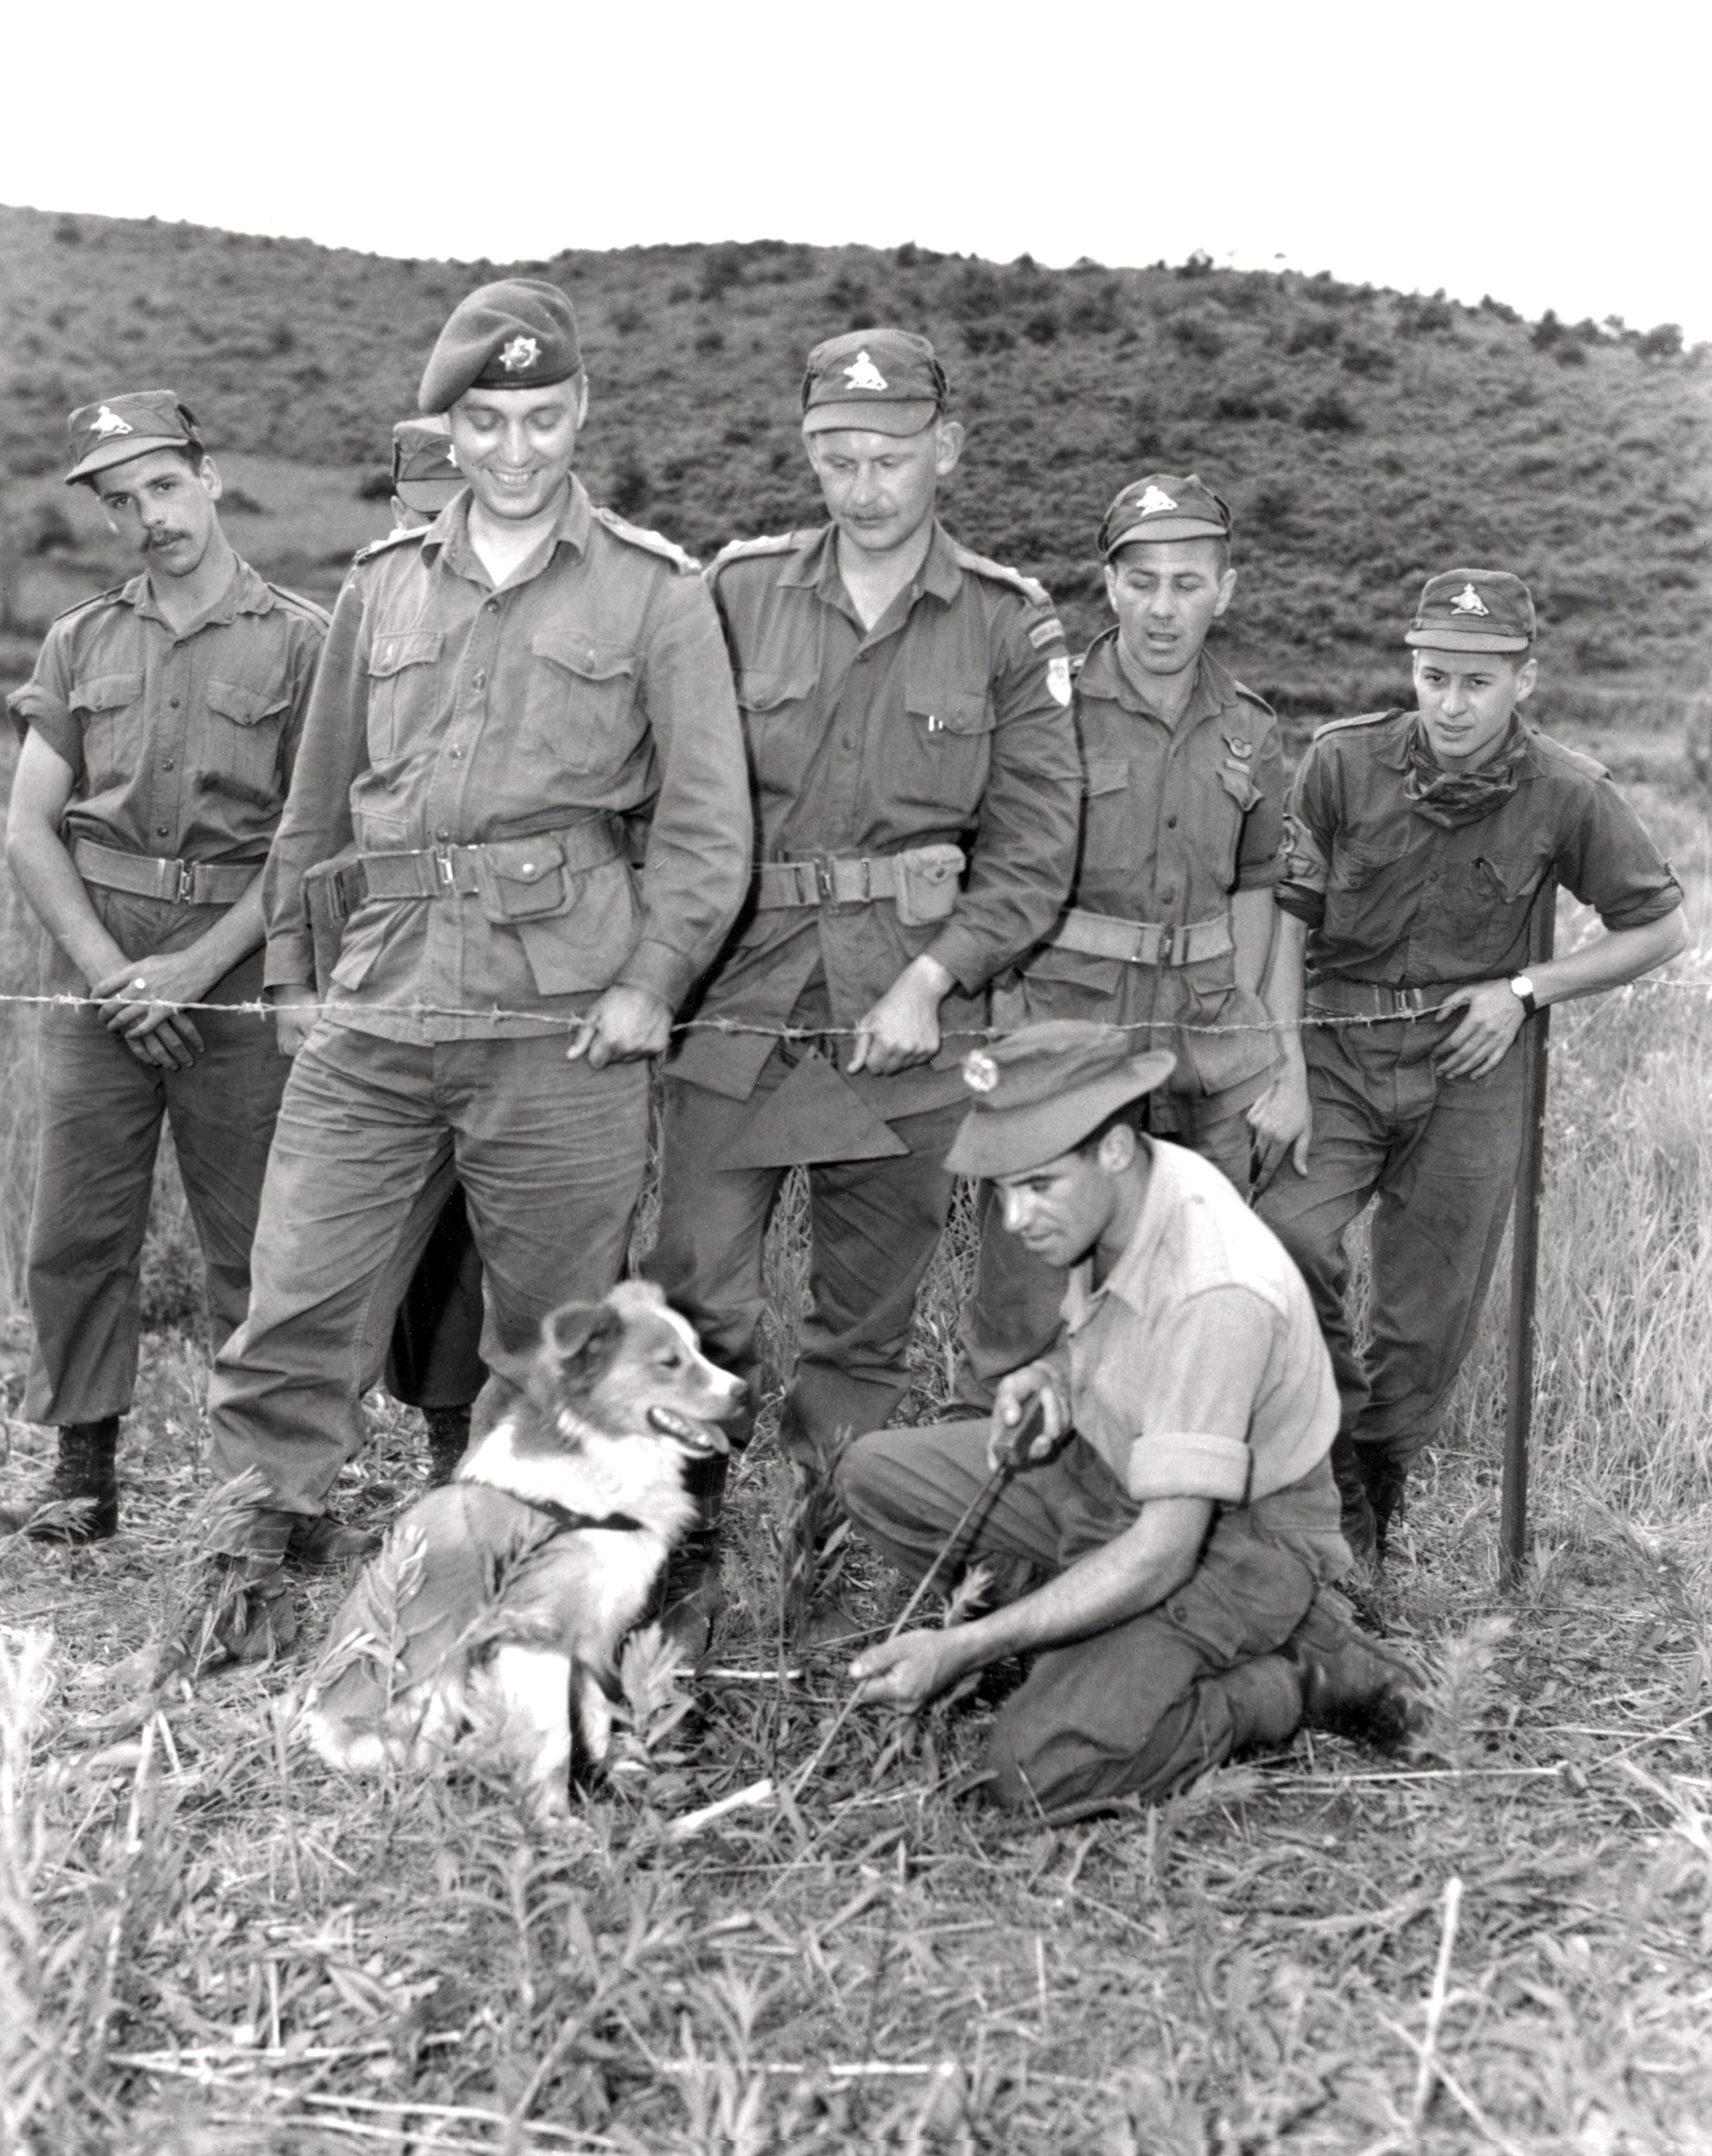 Historic Korean War Photo – A Dog Capable Of Detecting Landmines